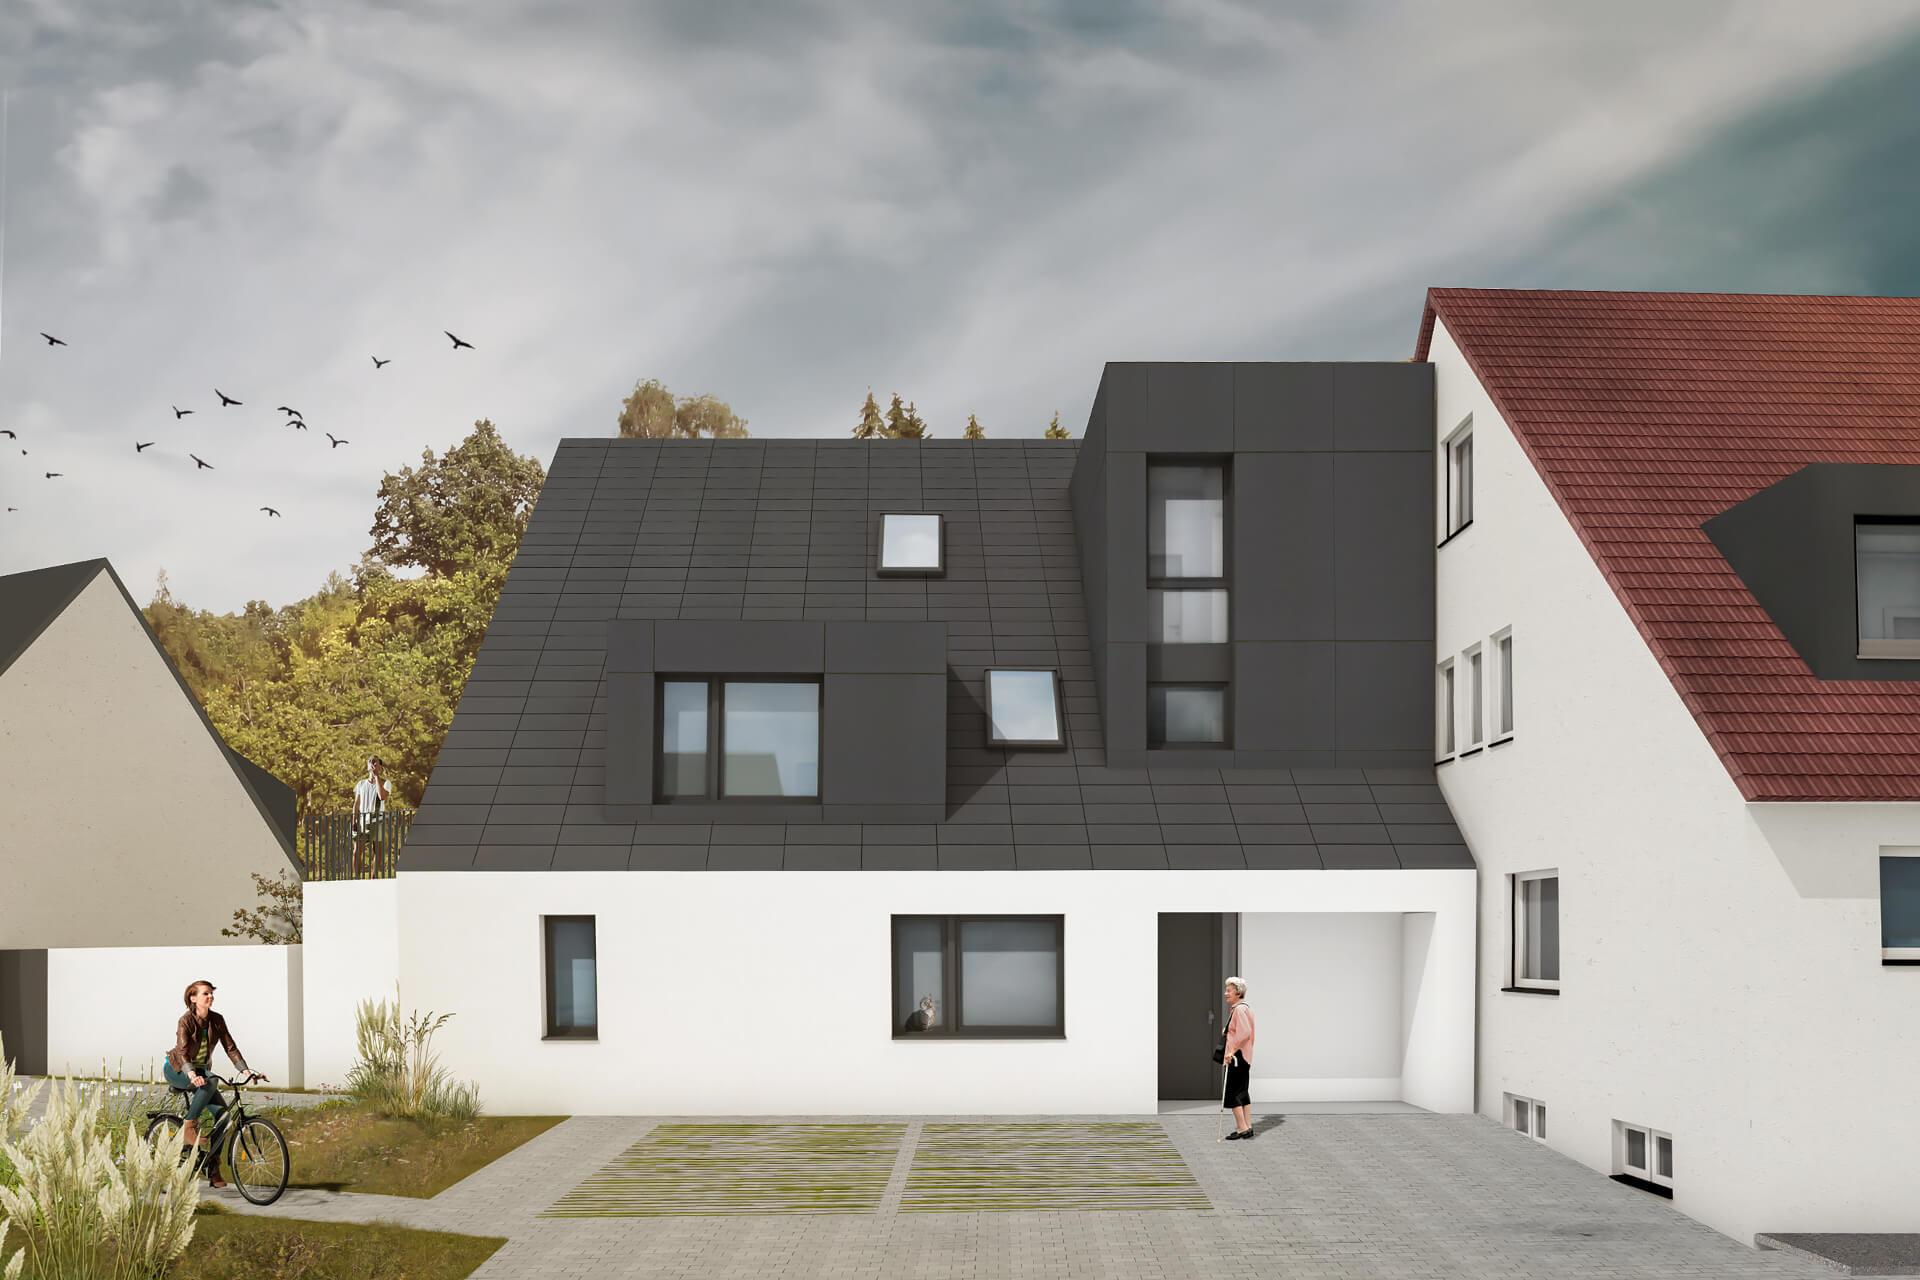 Perspektive Mehrfamilienhaus